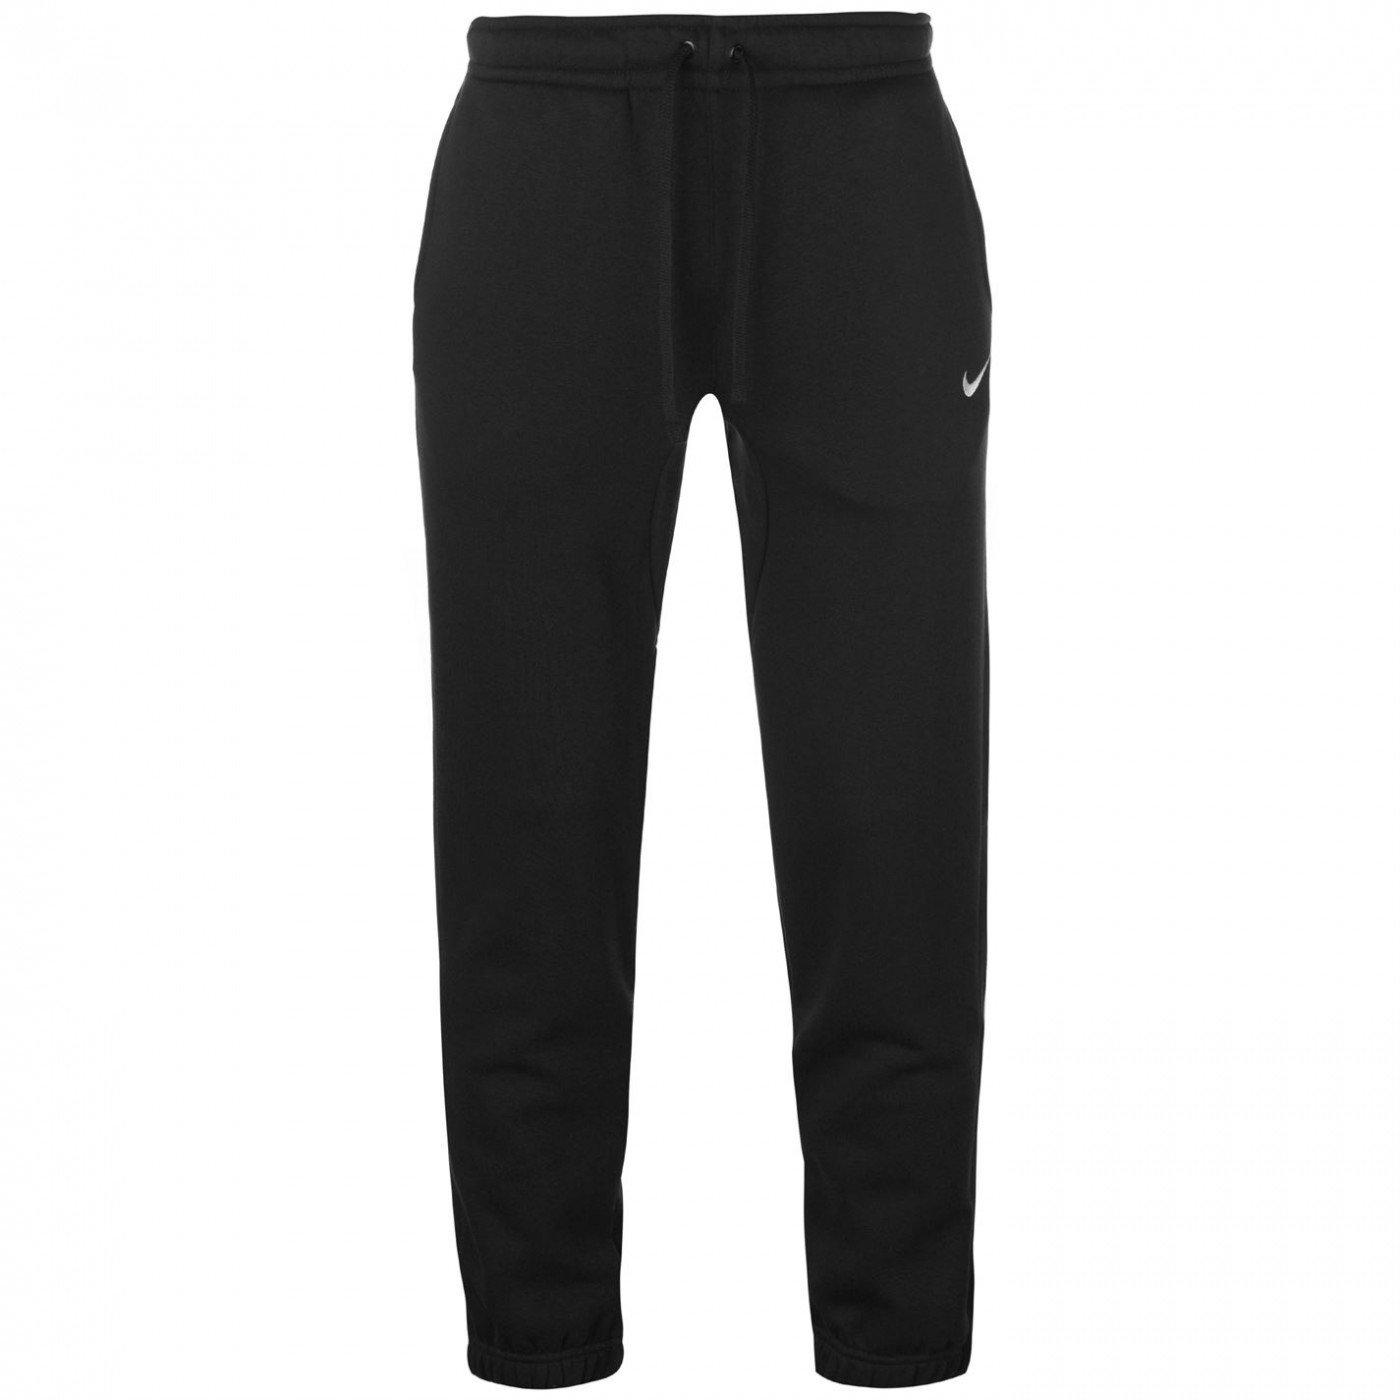 Men's sweatpants Nike Logo